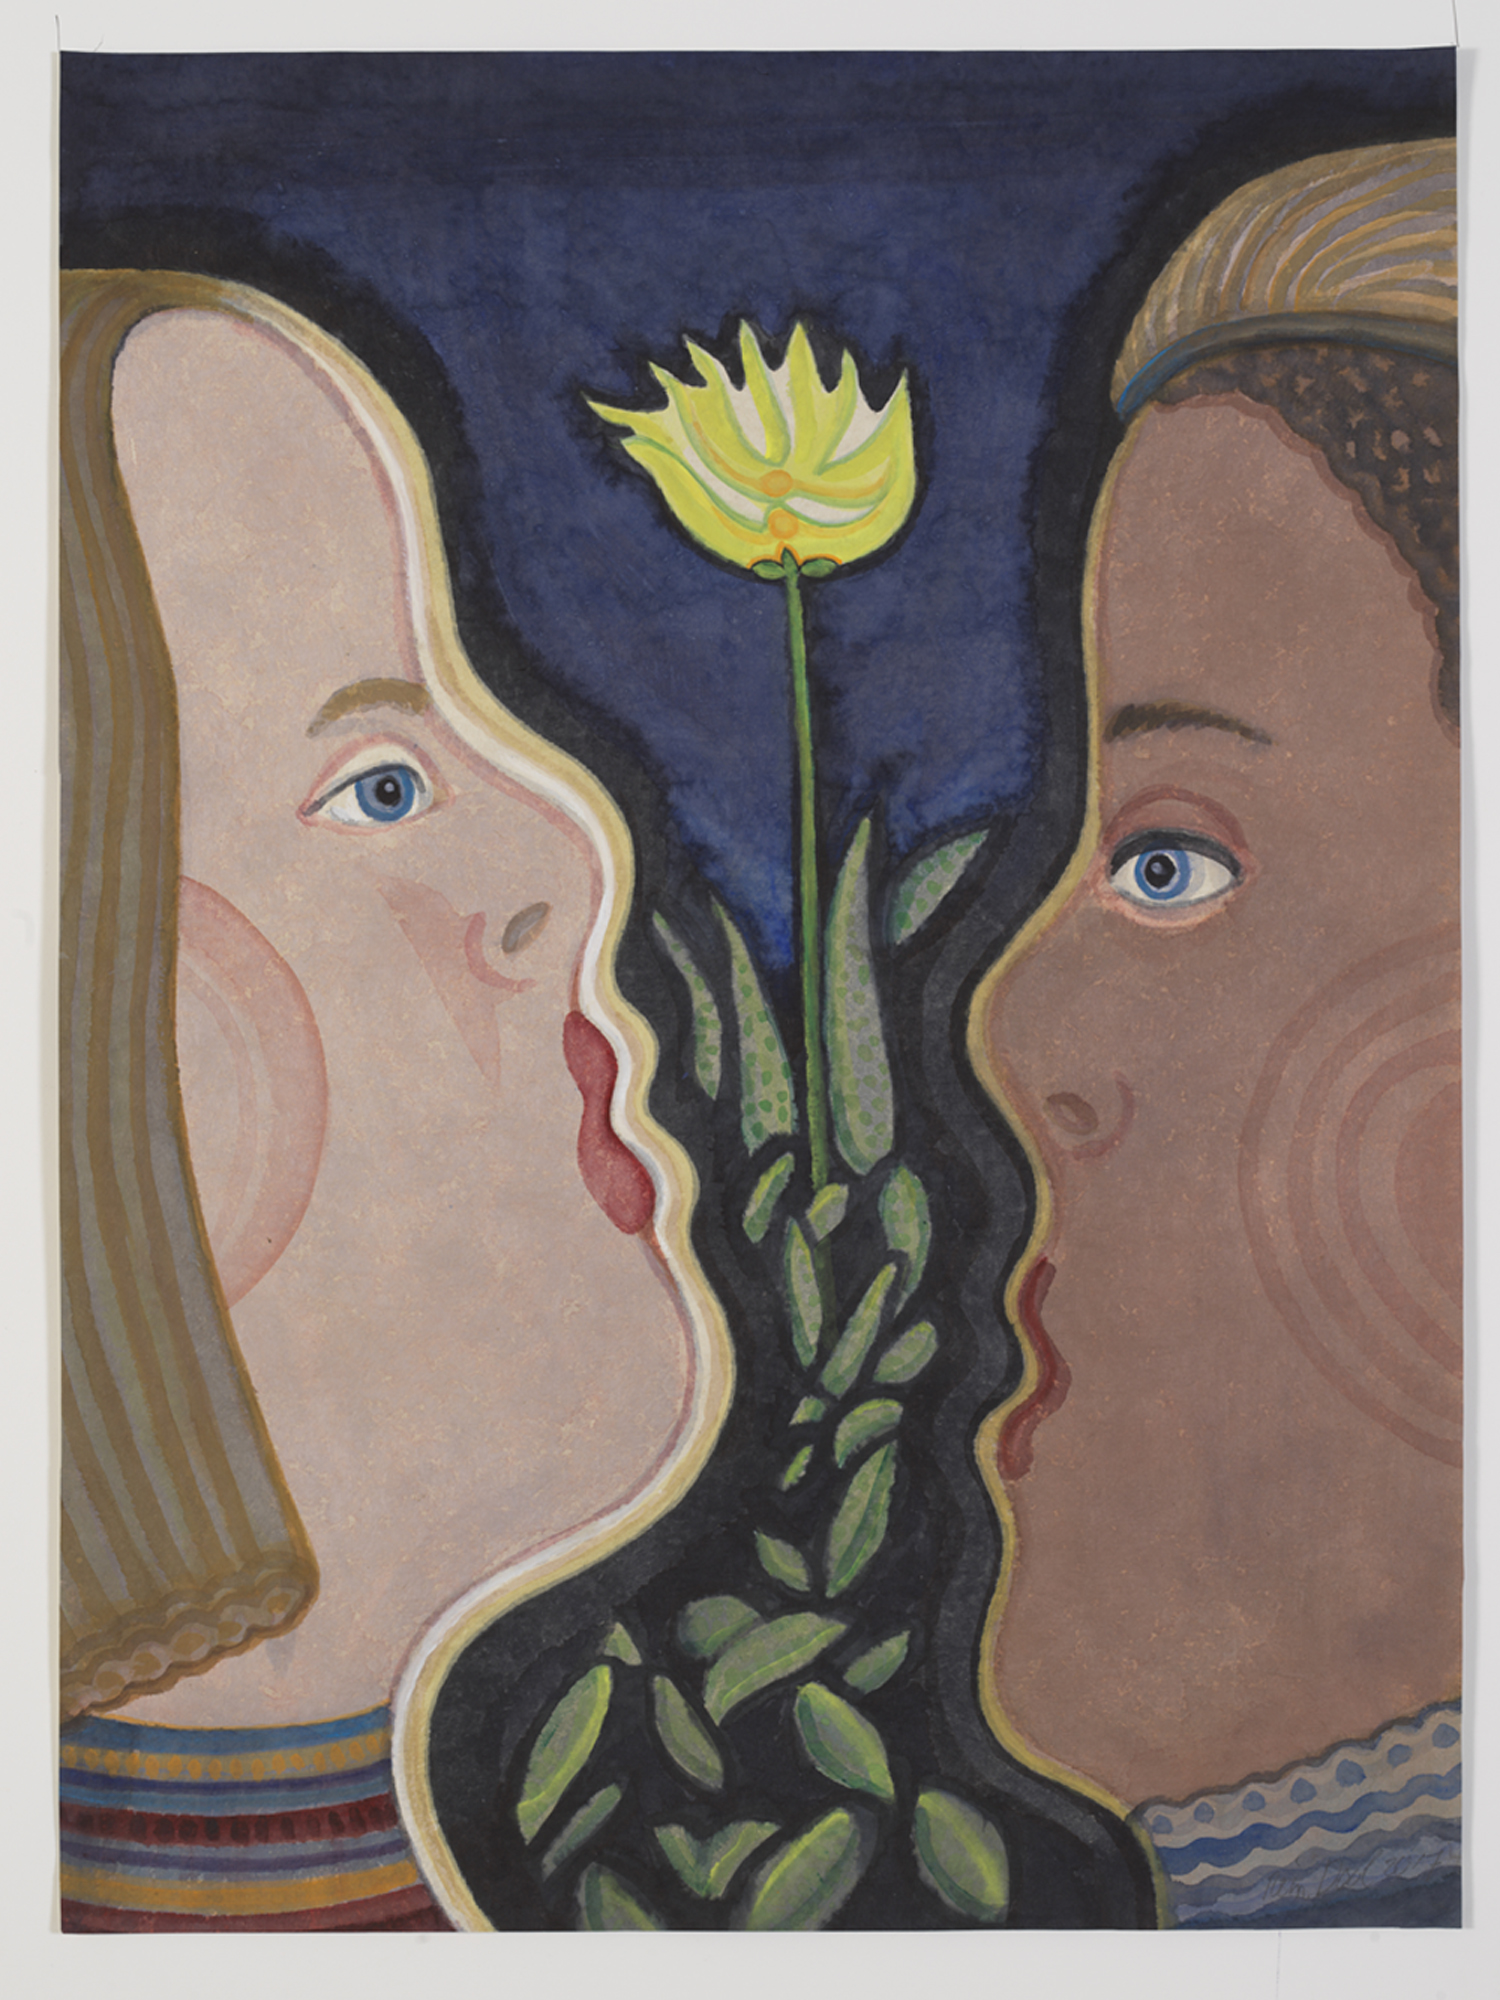 Gele bloem - Rein Dool, 80x60 cm. aquarel 2017